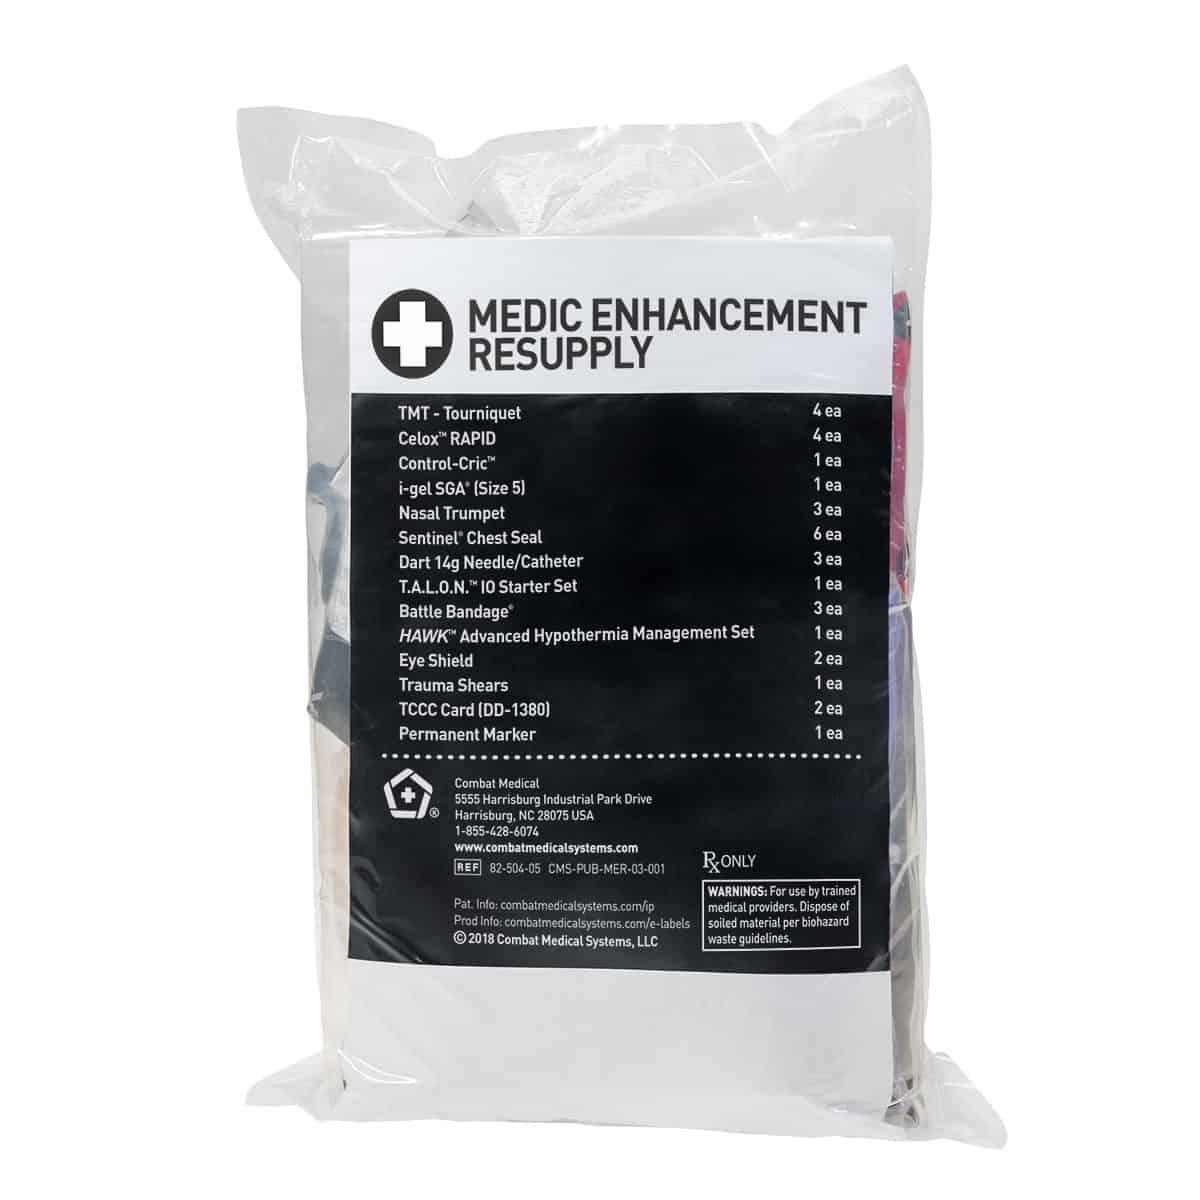 medic enhancement resupply